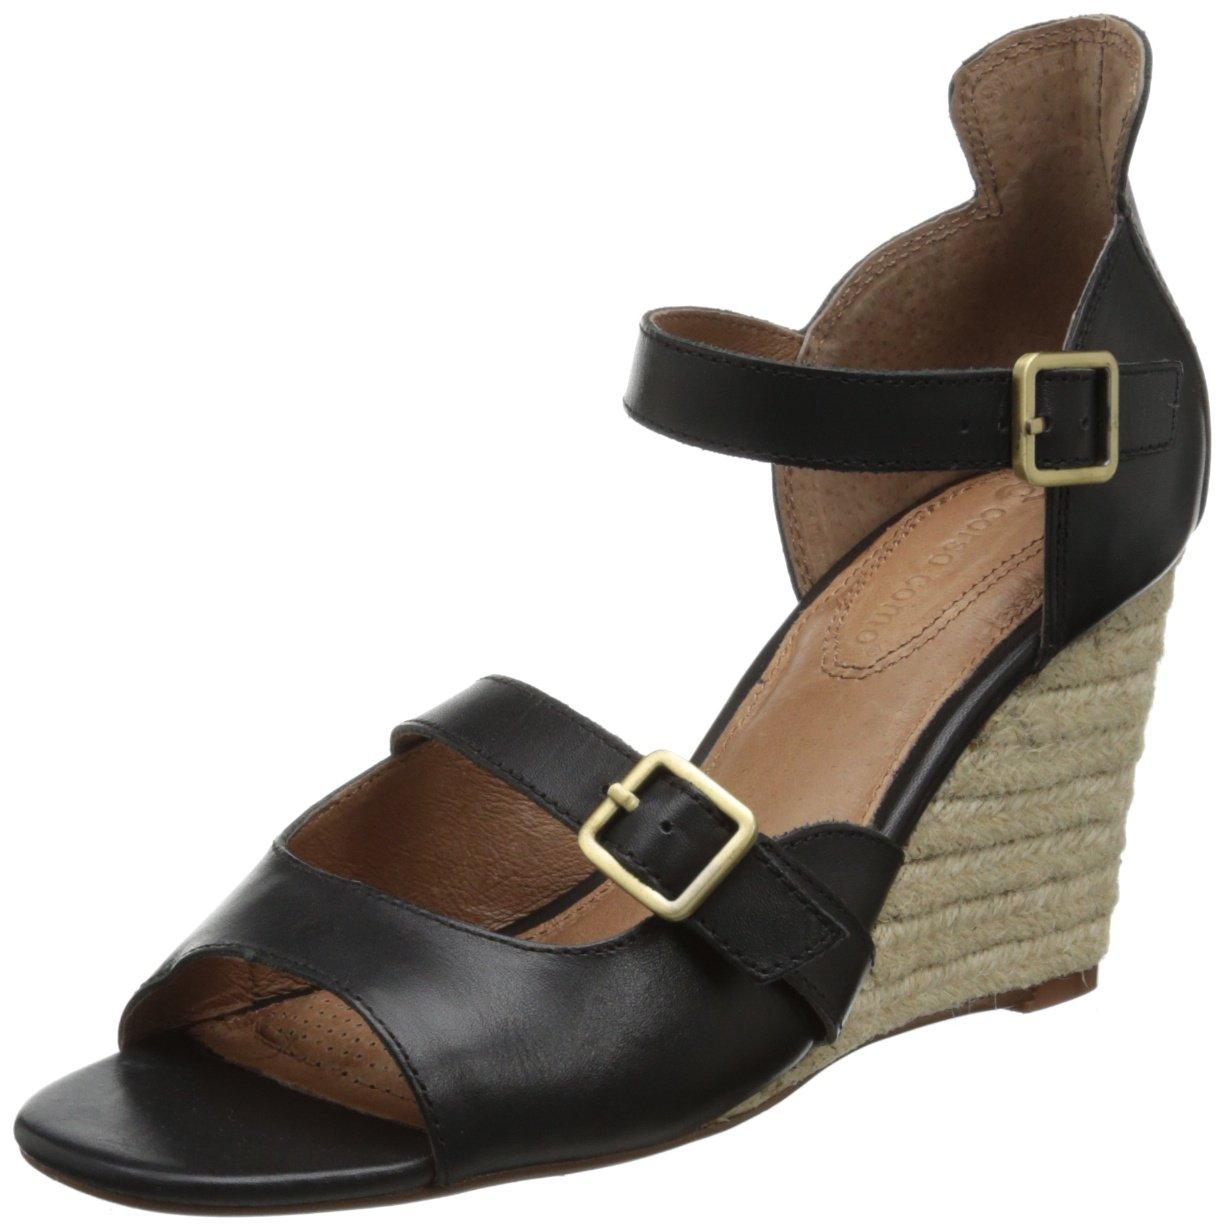 Corso Como Women's Hello Wedge Sandal B00EWG1AN4 7.5 B(M) US|Black Vintage Calf